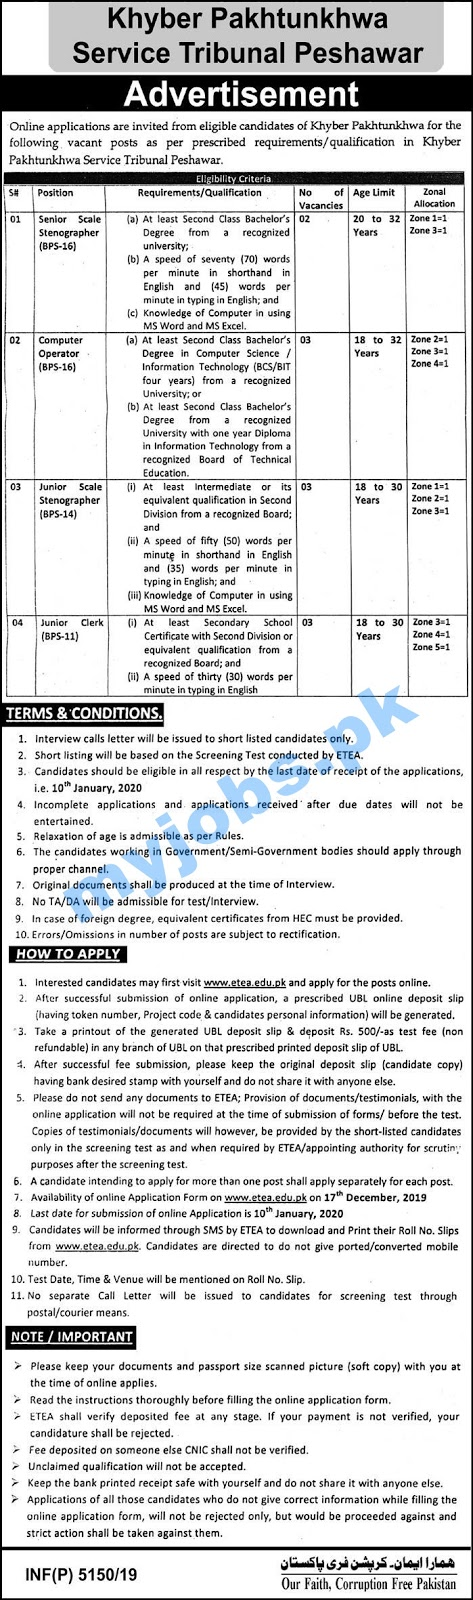 Jobs in Khyber Pakhtunkhwa Service Tribunal Peshawar 2019丨KPSTP Jobs 2019丨Apply Now